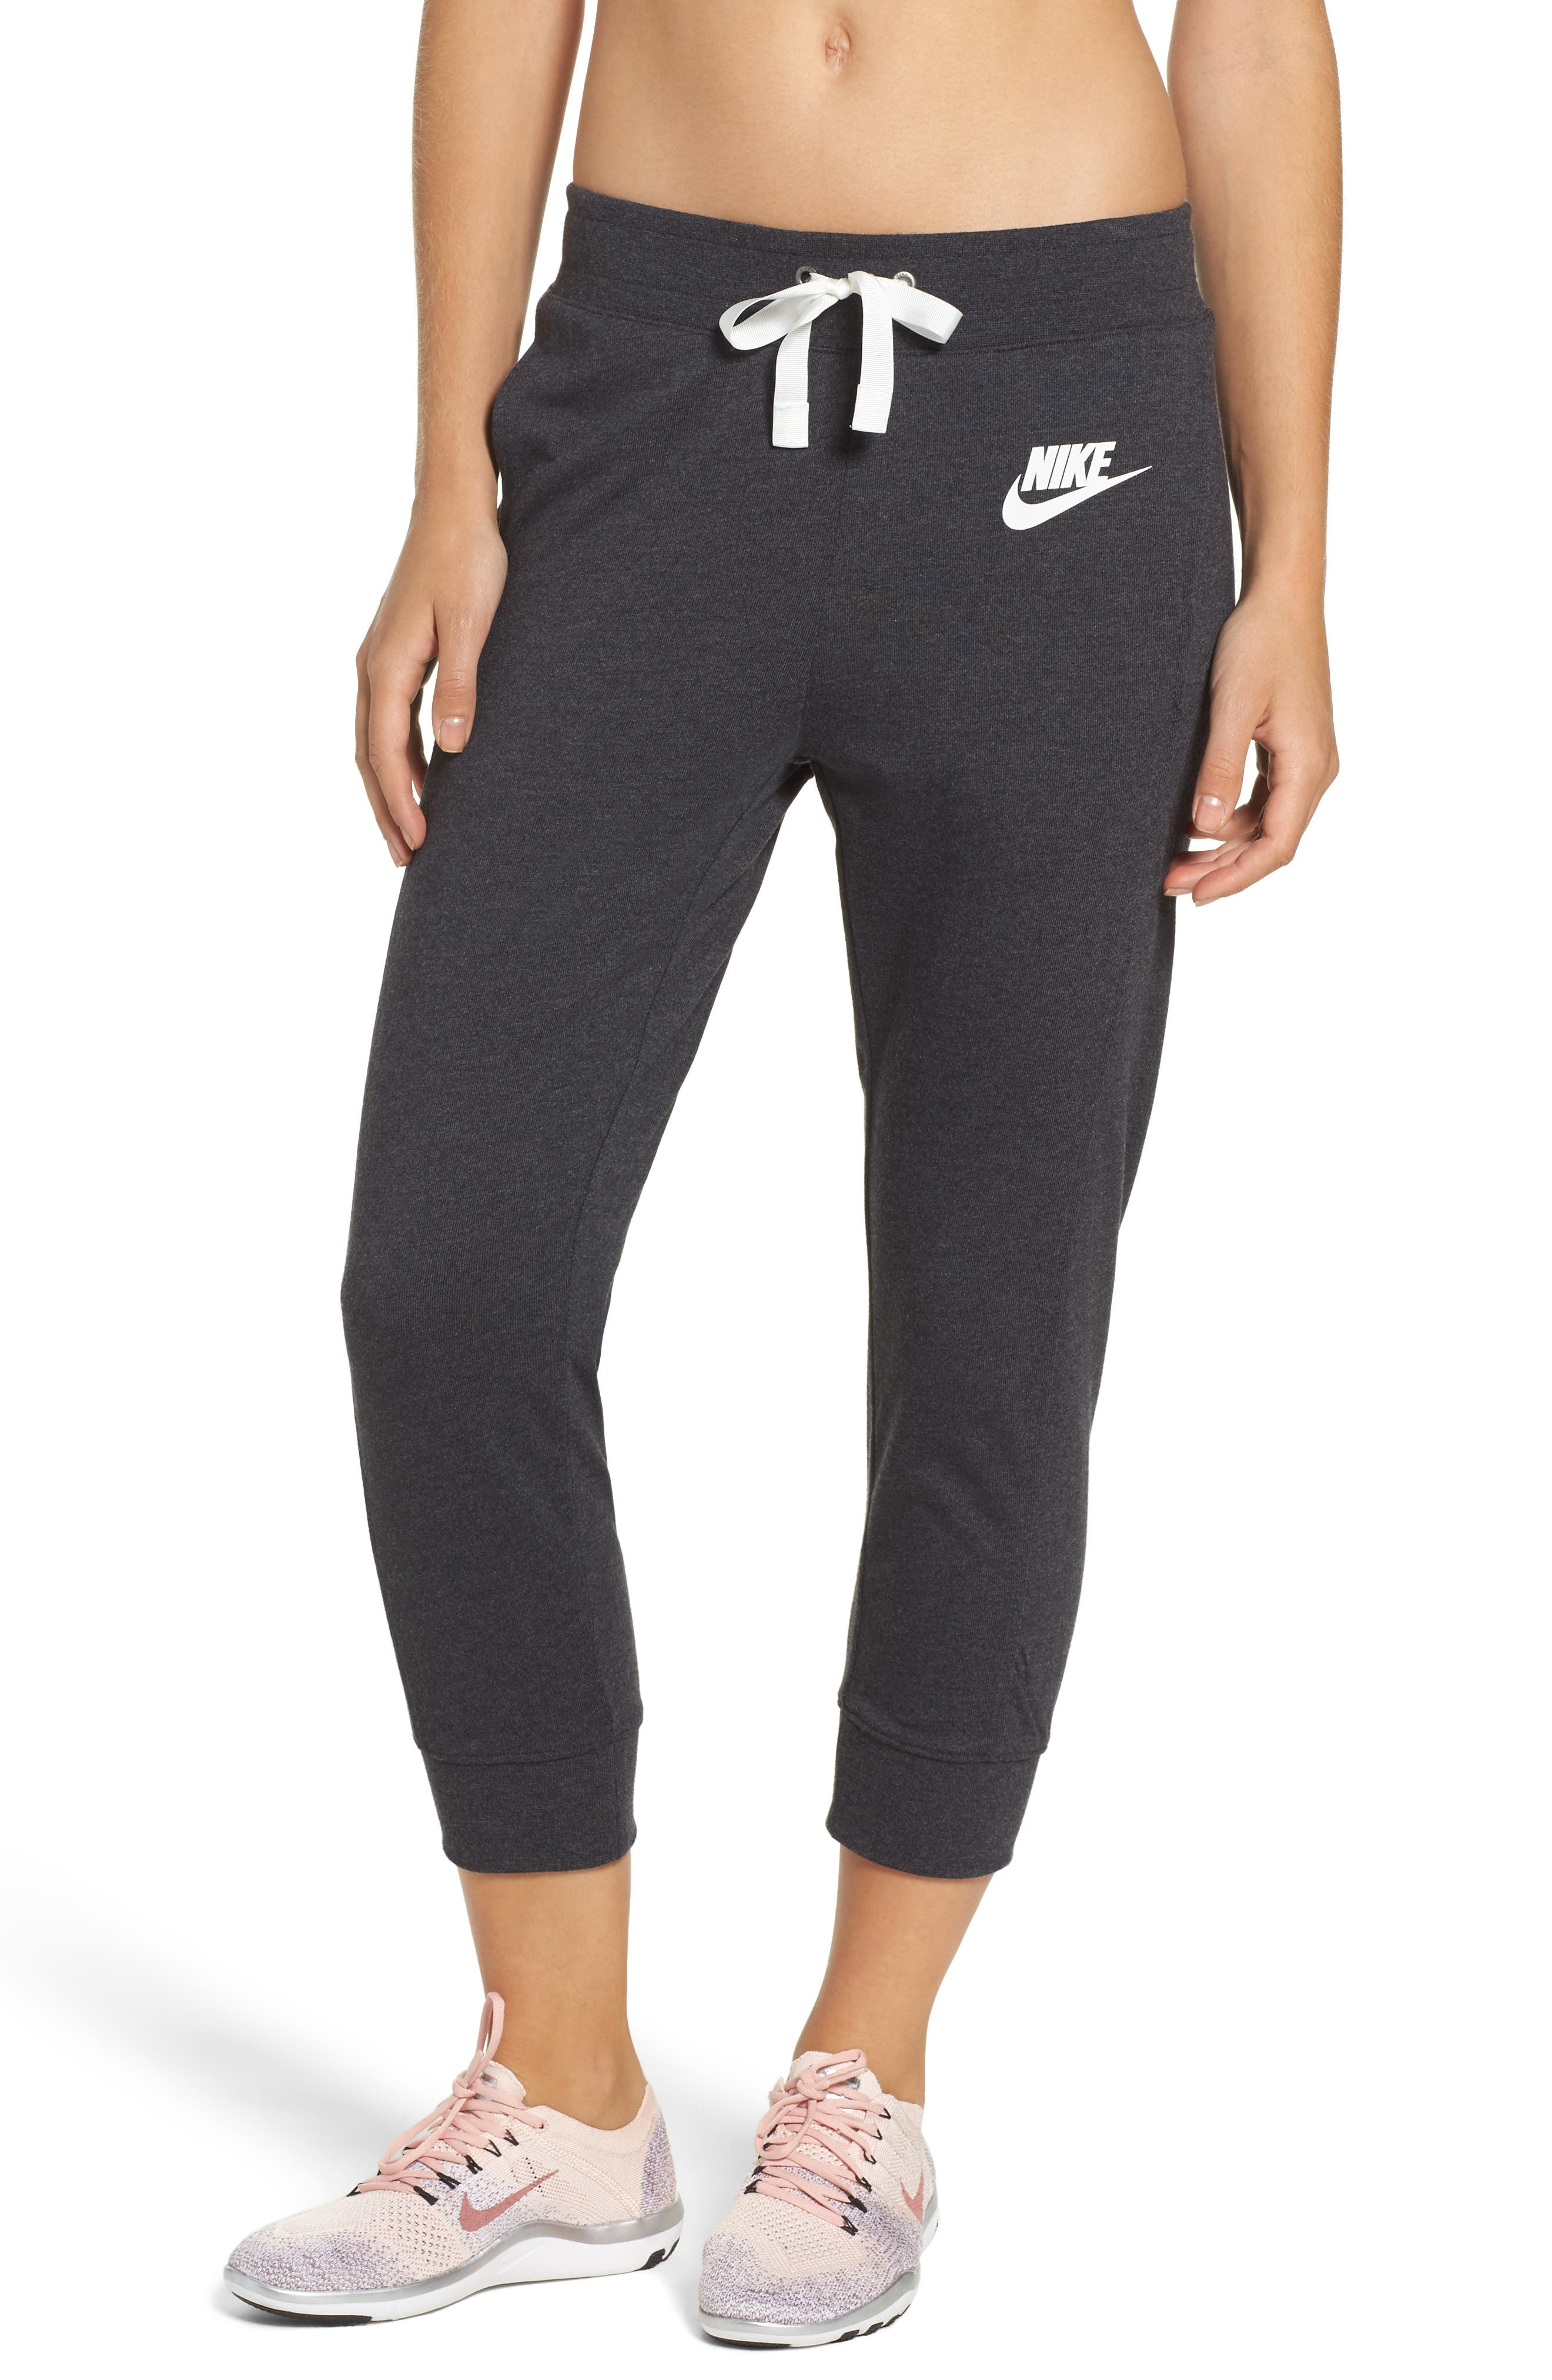 Women's Capris - Nike Gym Vintage - Night Maroon/Sail : P41v4086